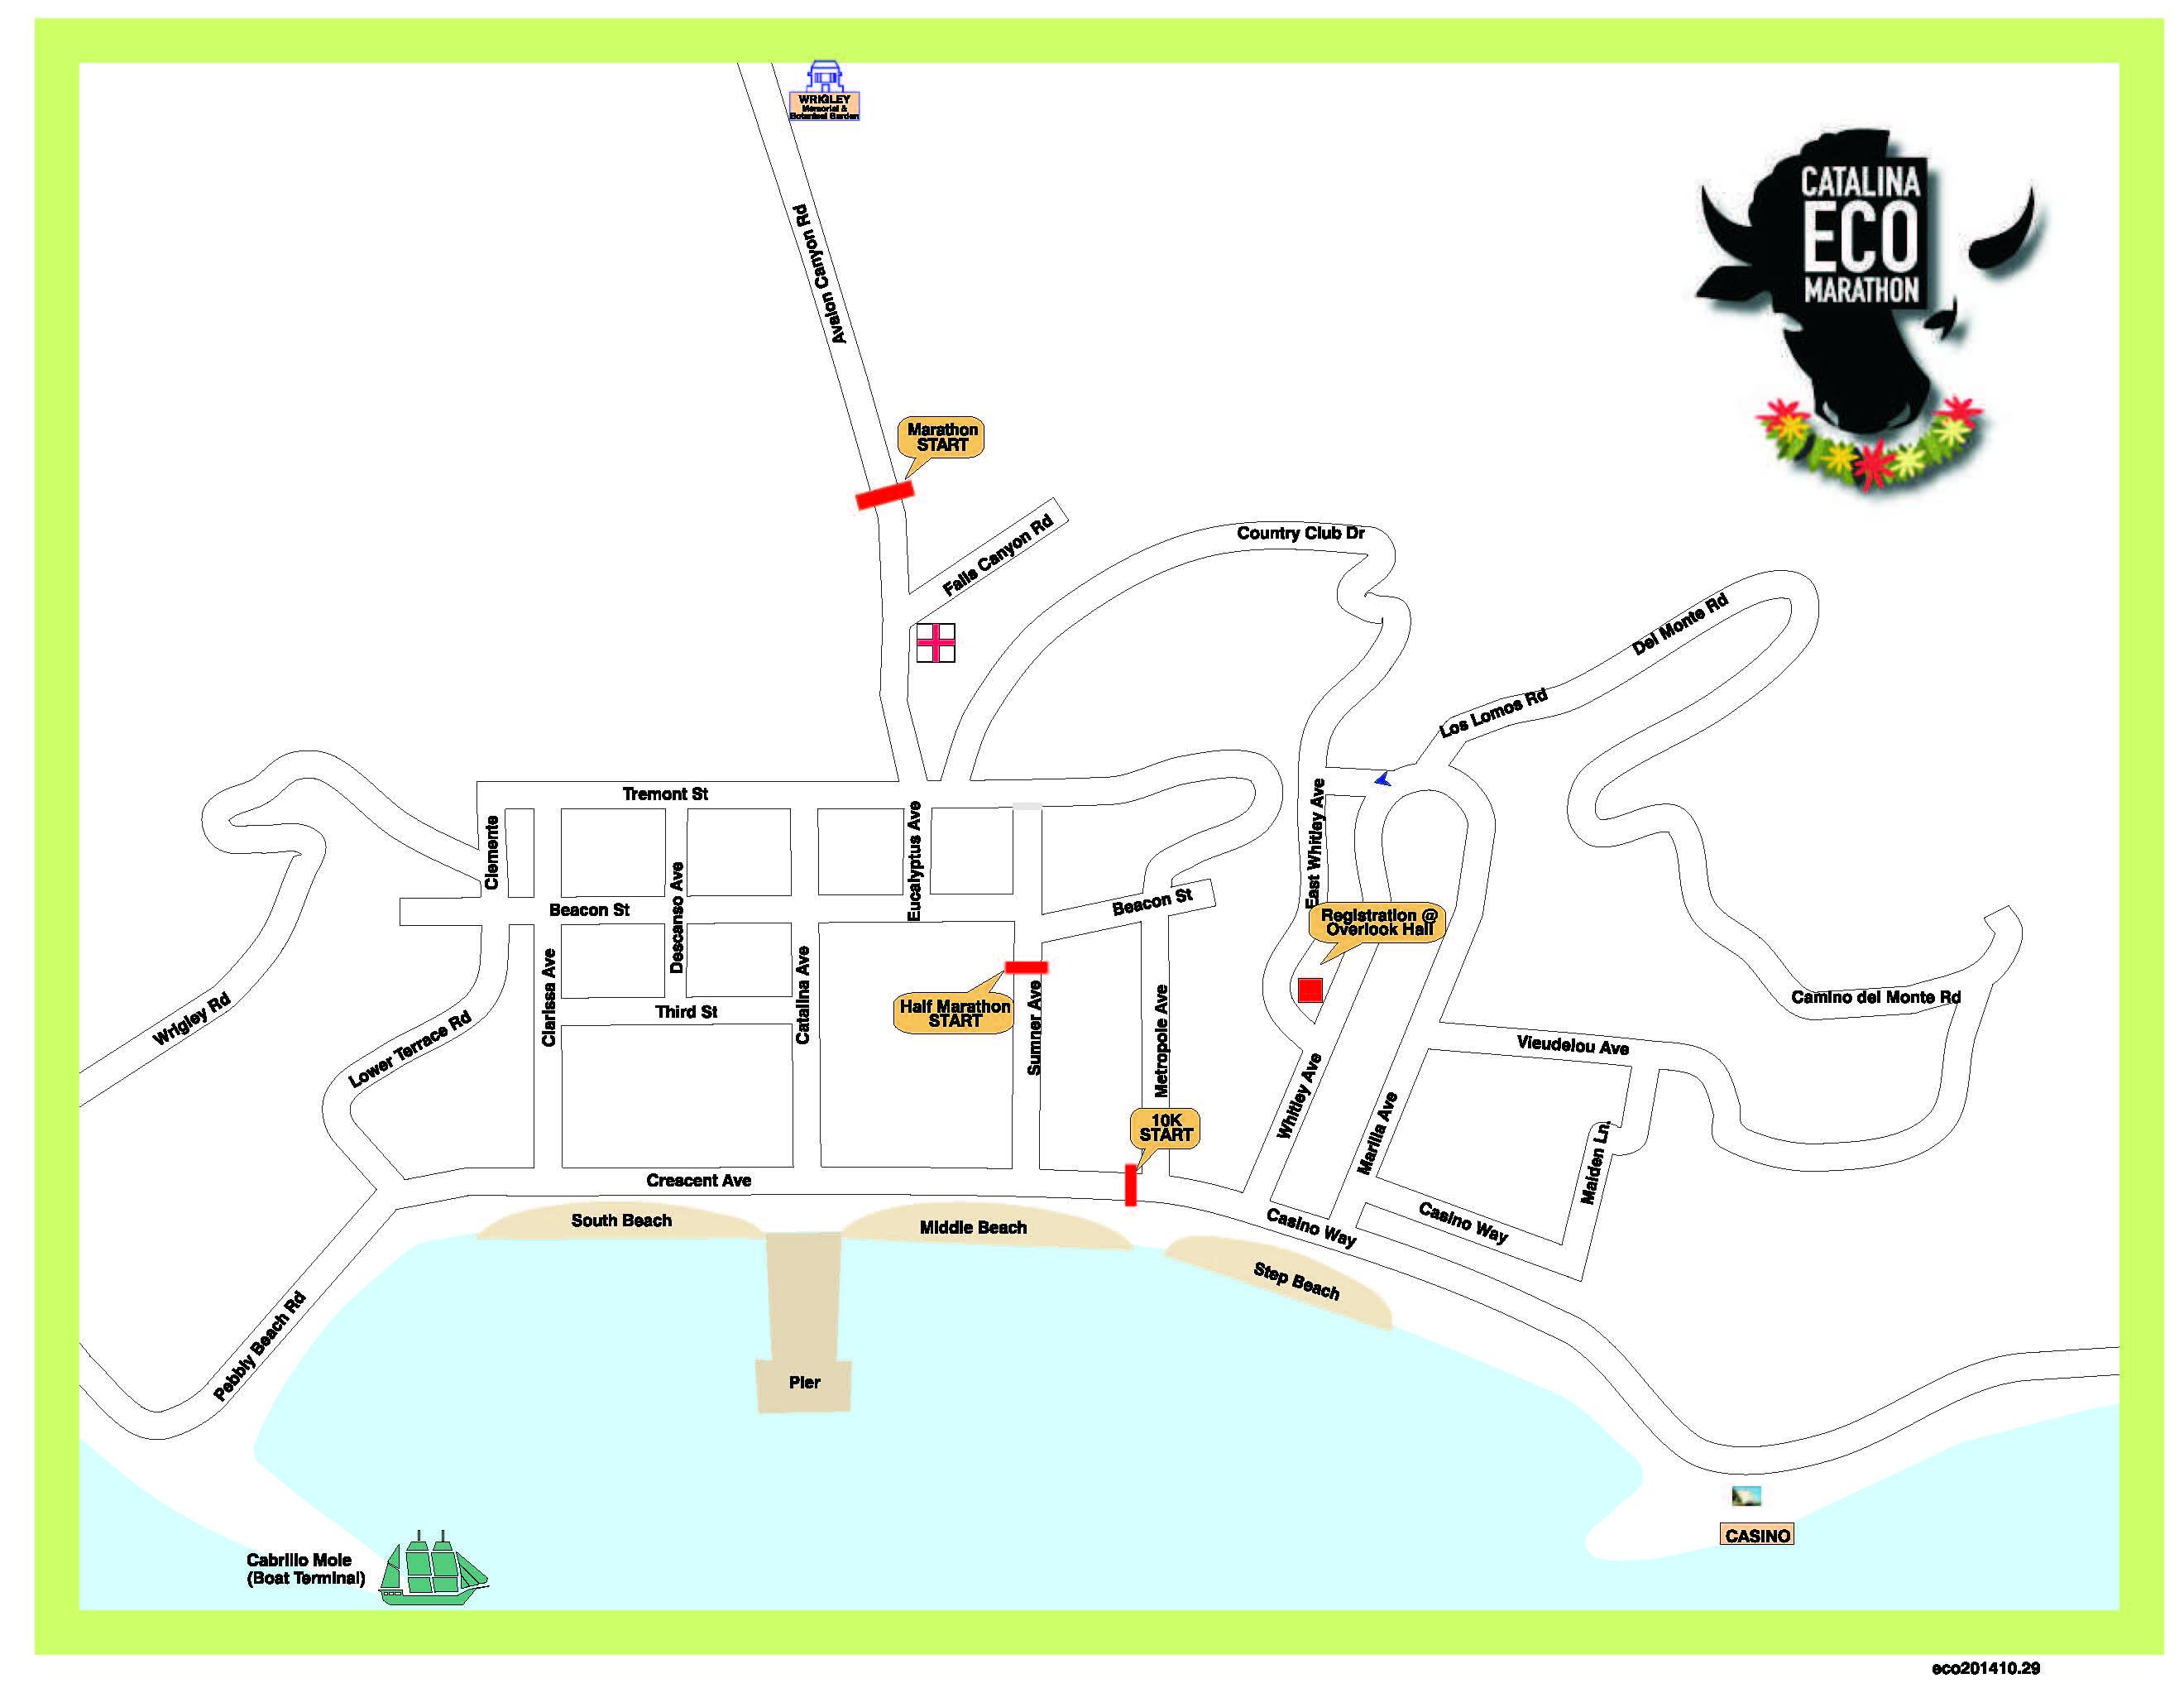 startline map